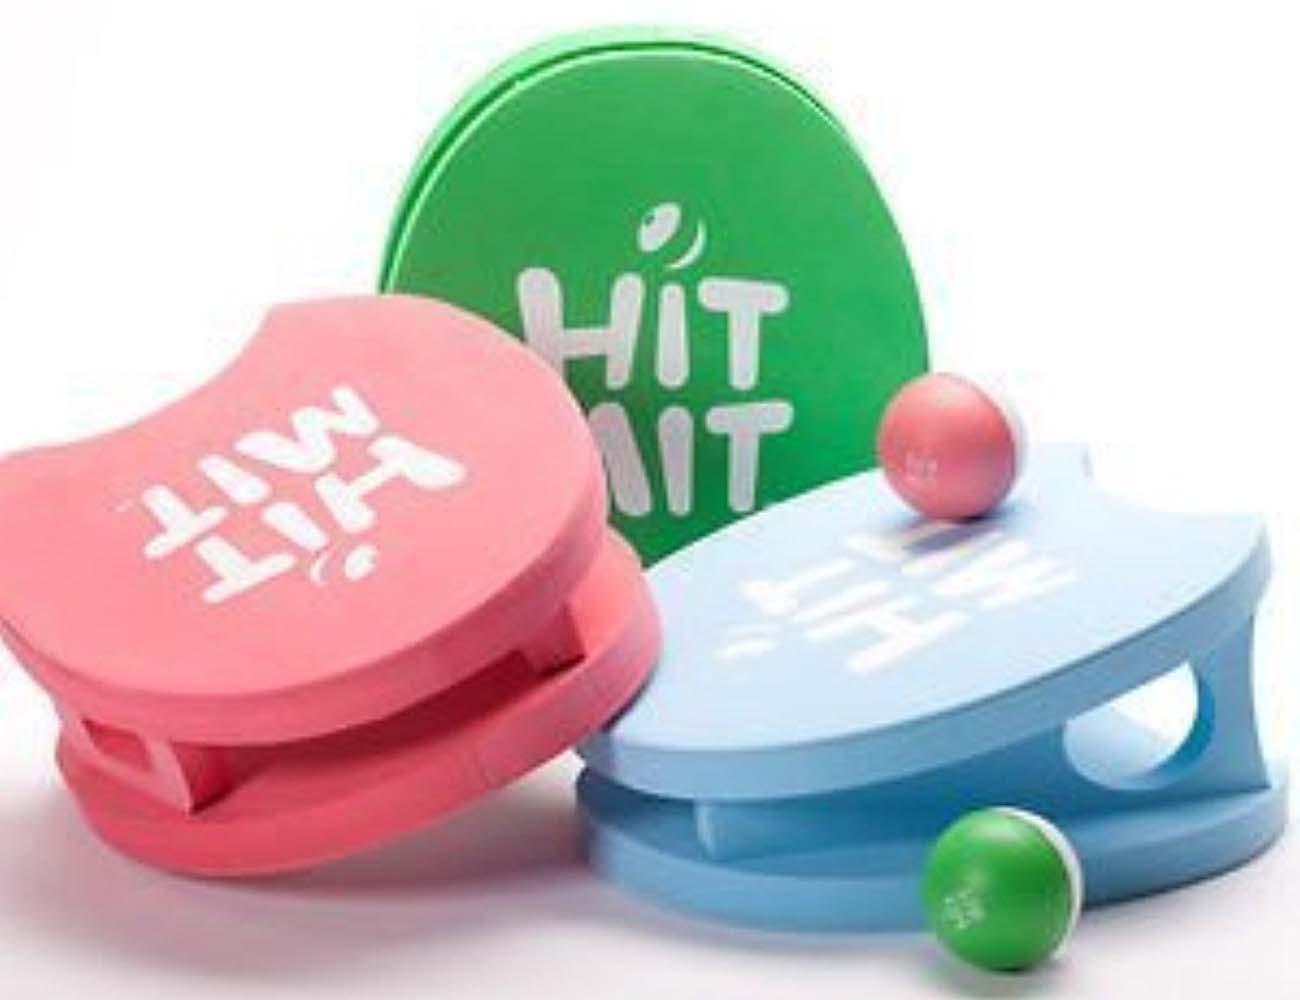 Hit Mit Set – Four Personal Wearable Paddleball Set